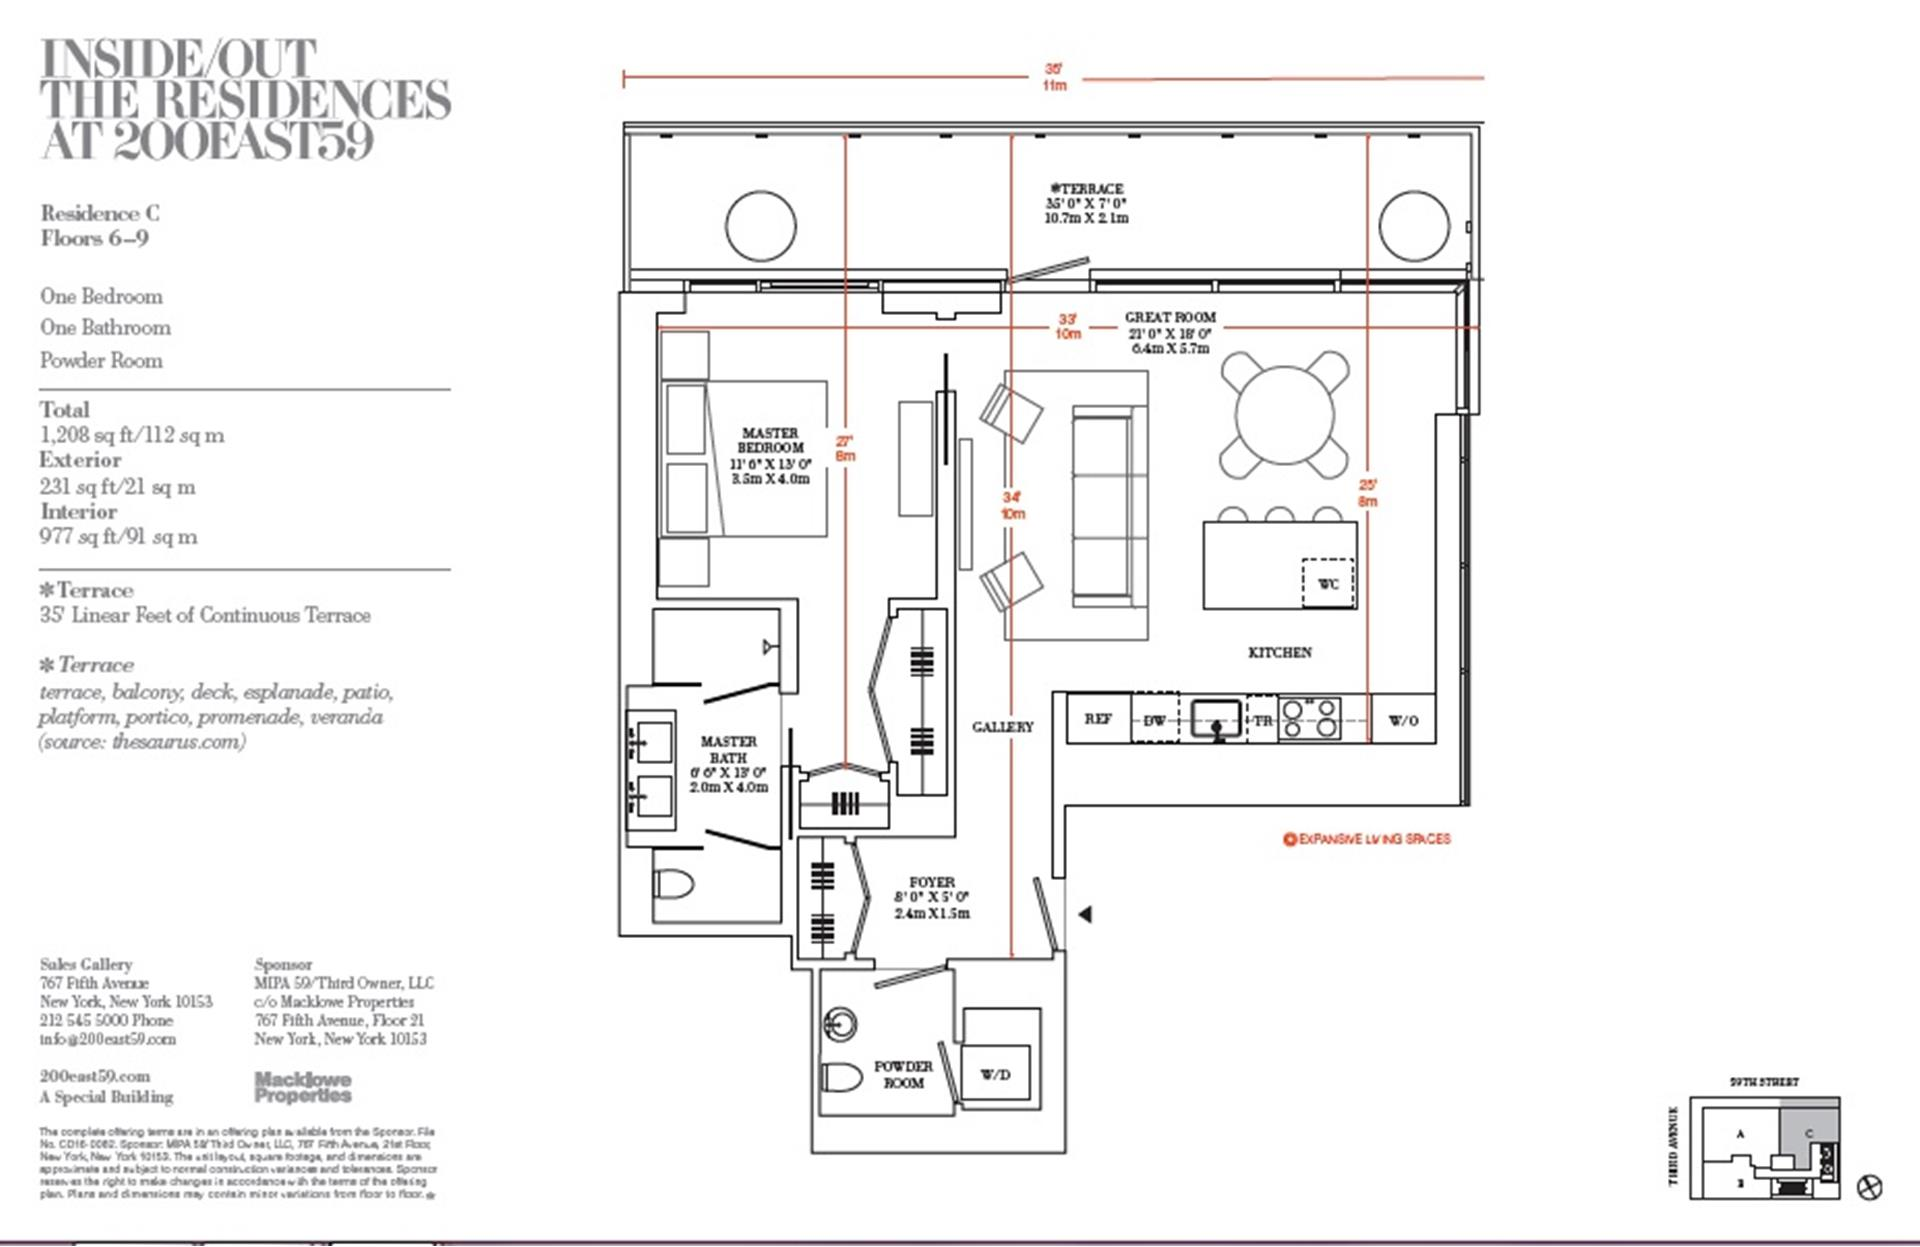 Floor plan of 200 East 59th St, 6C - Midtown, New York